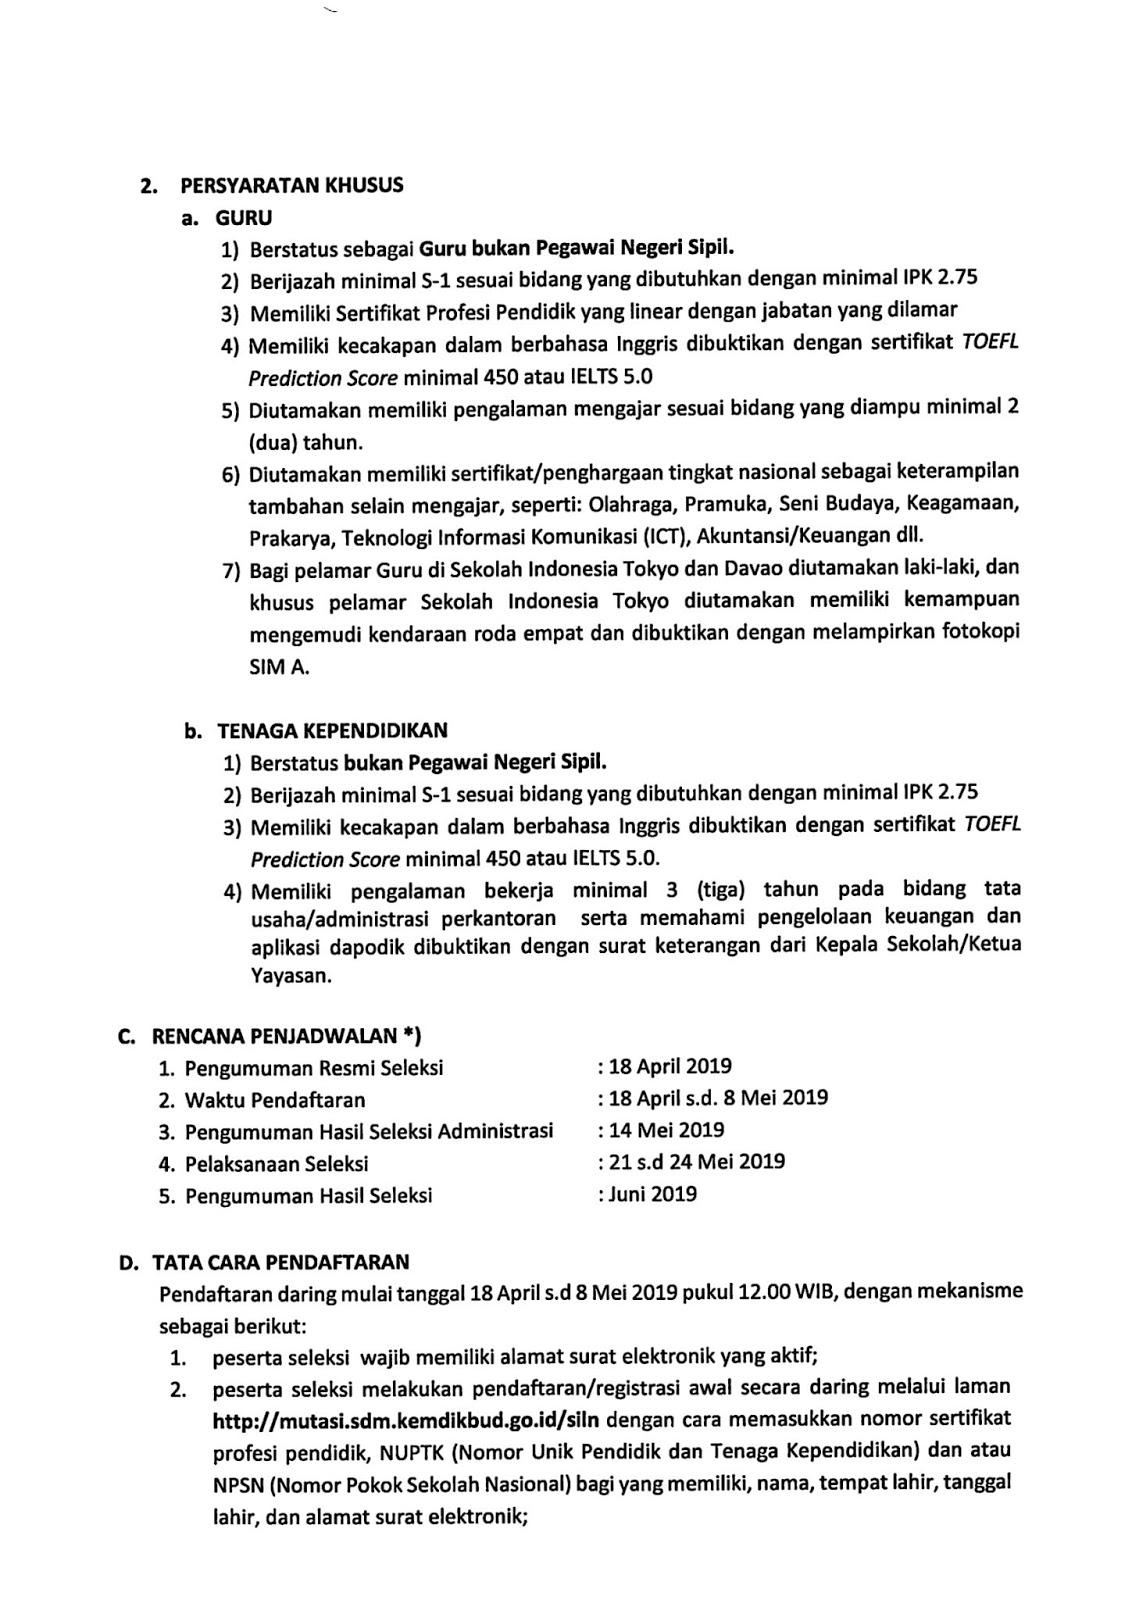 Lowongan Kerja Guru Dan Tenaga Kependidikan Kementerian Pendidikan Dan Kebudayaan Rekrutmen Lowongan Kerja Bulan Februari 2021